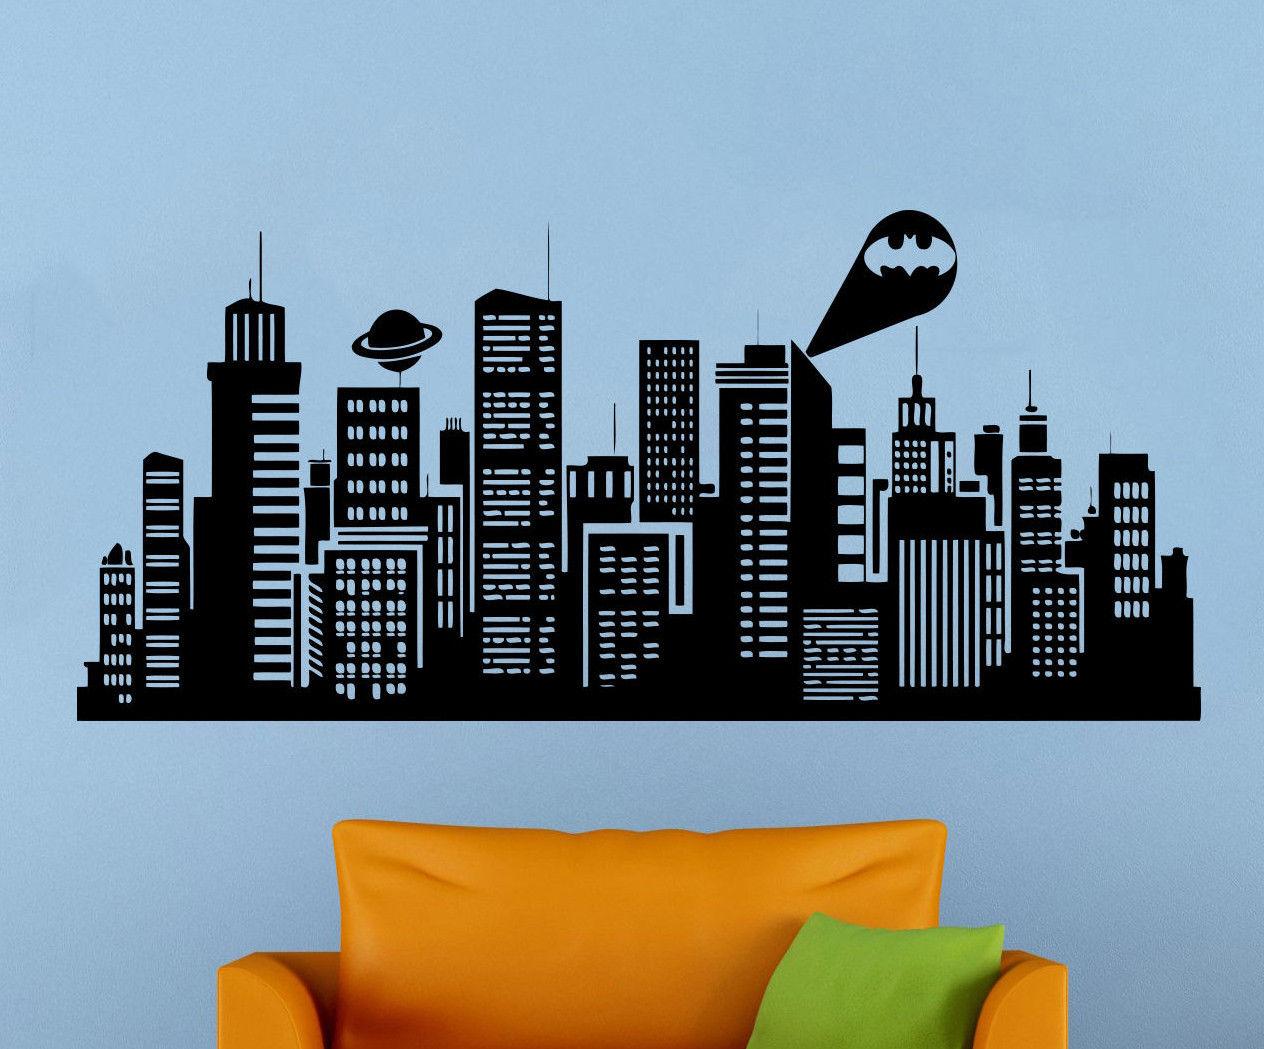 Batman Gotham City Wall Decal Comics Vinyl Sticker Kids Room Home Art Decor E605